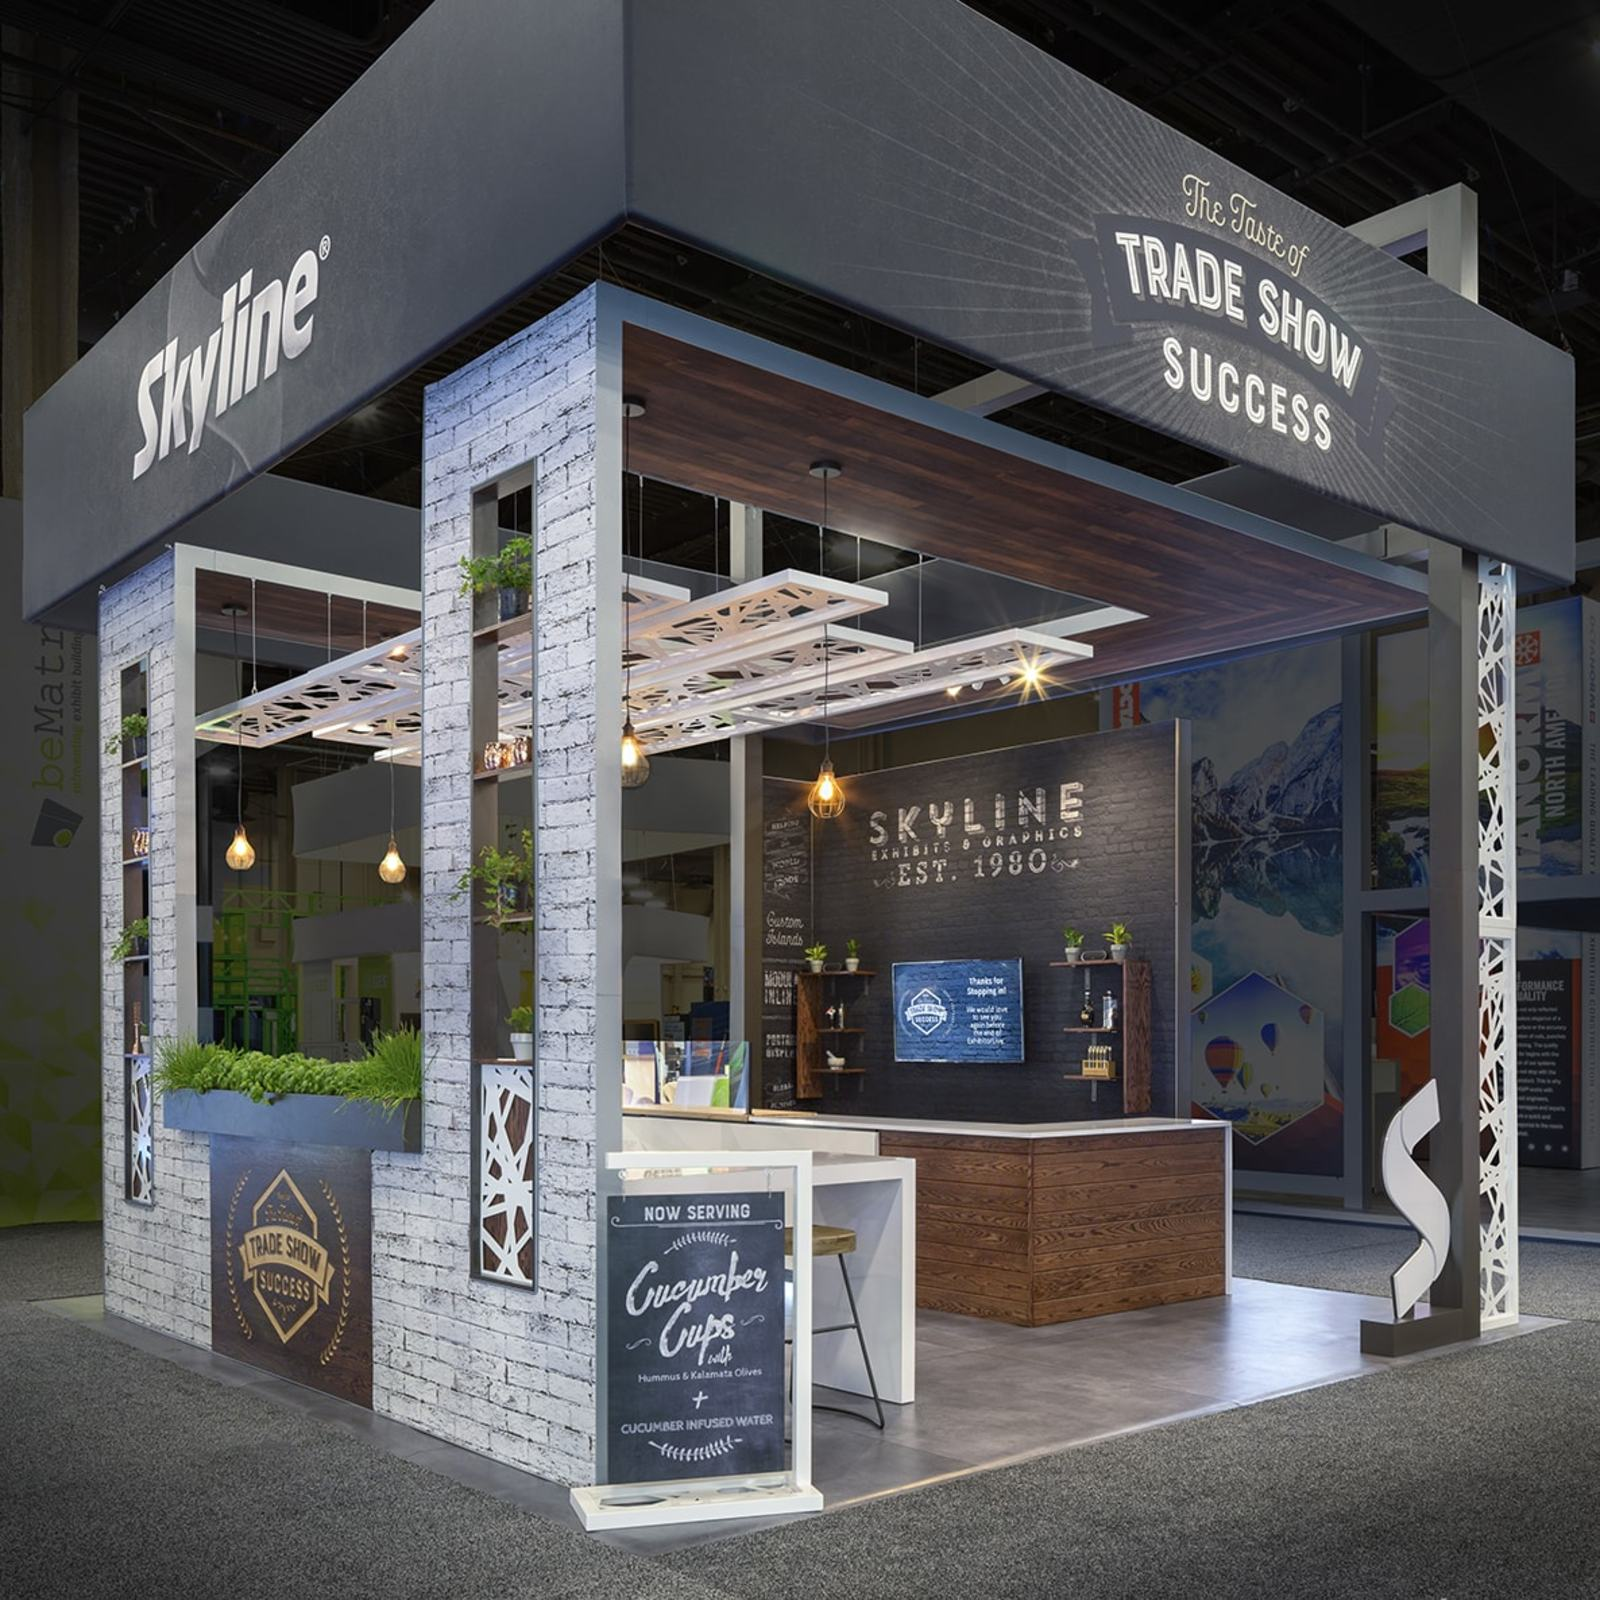 Skyline trade show display